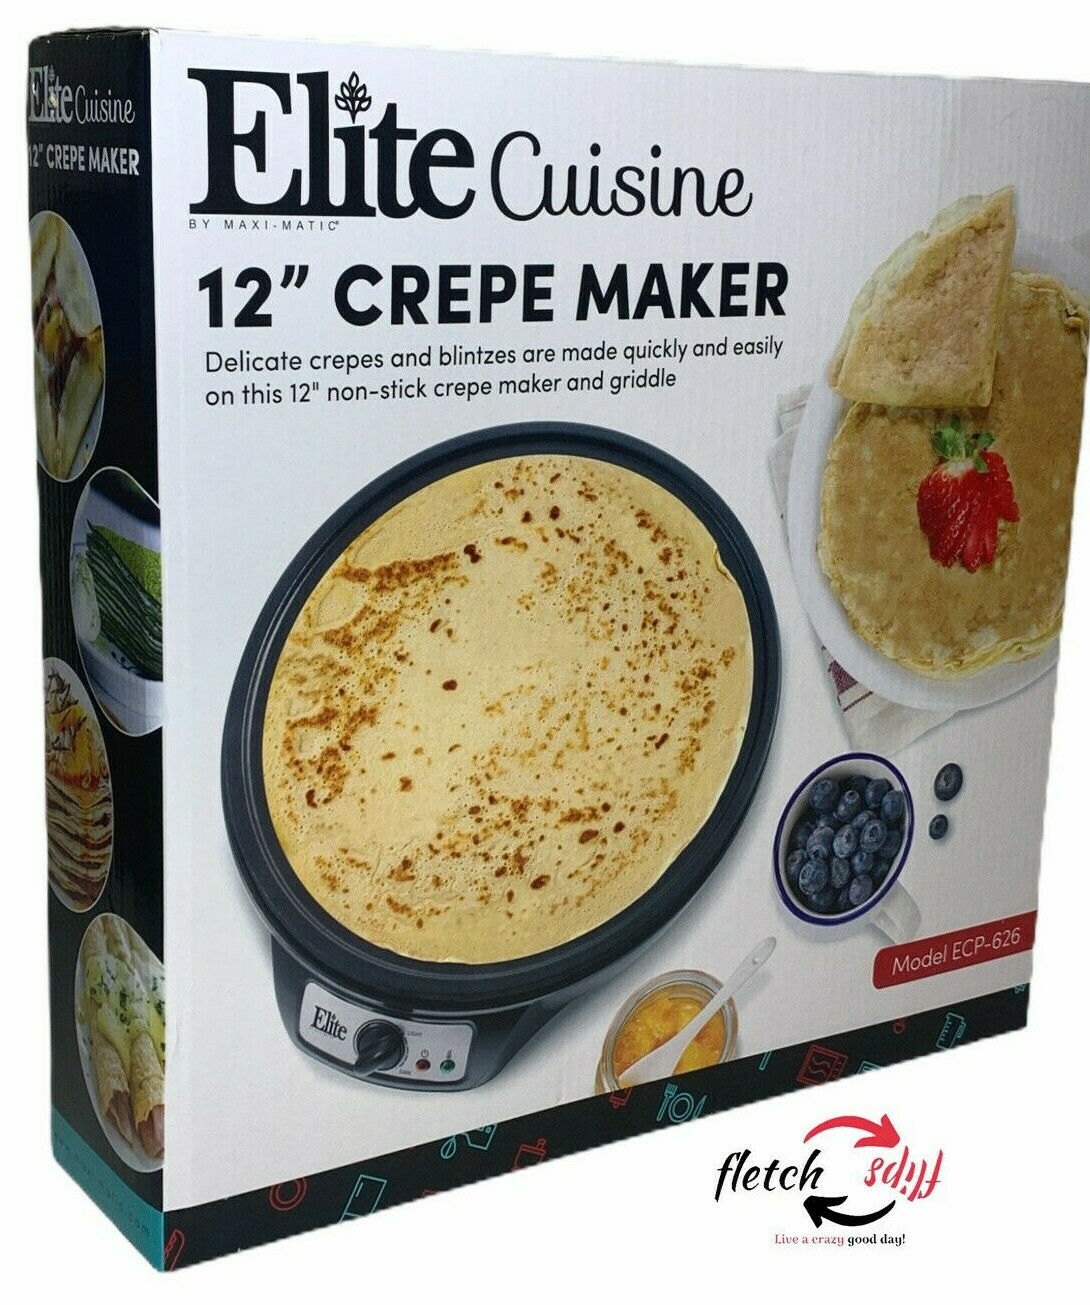 "ELITE CUISINE 12"" CREPE MAKER"